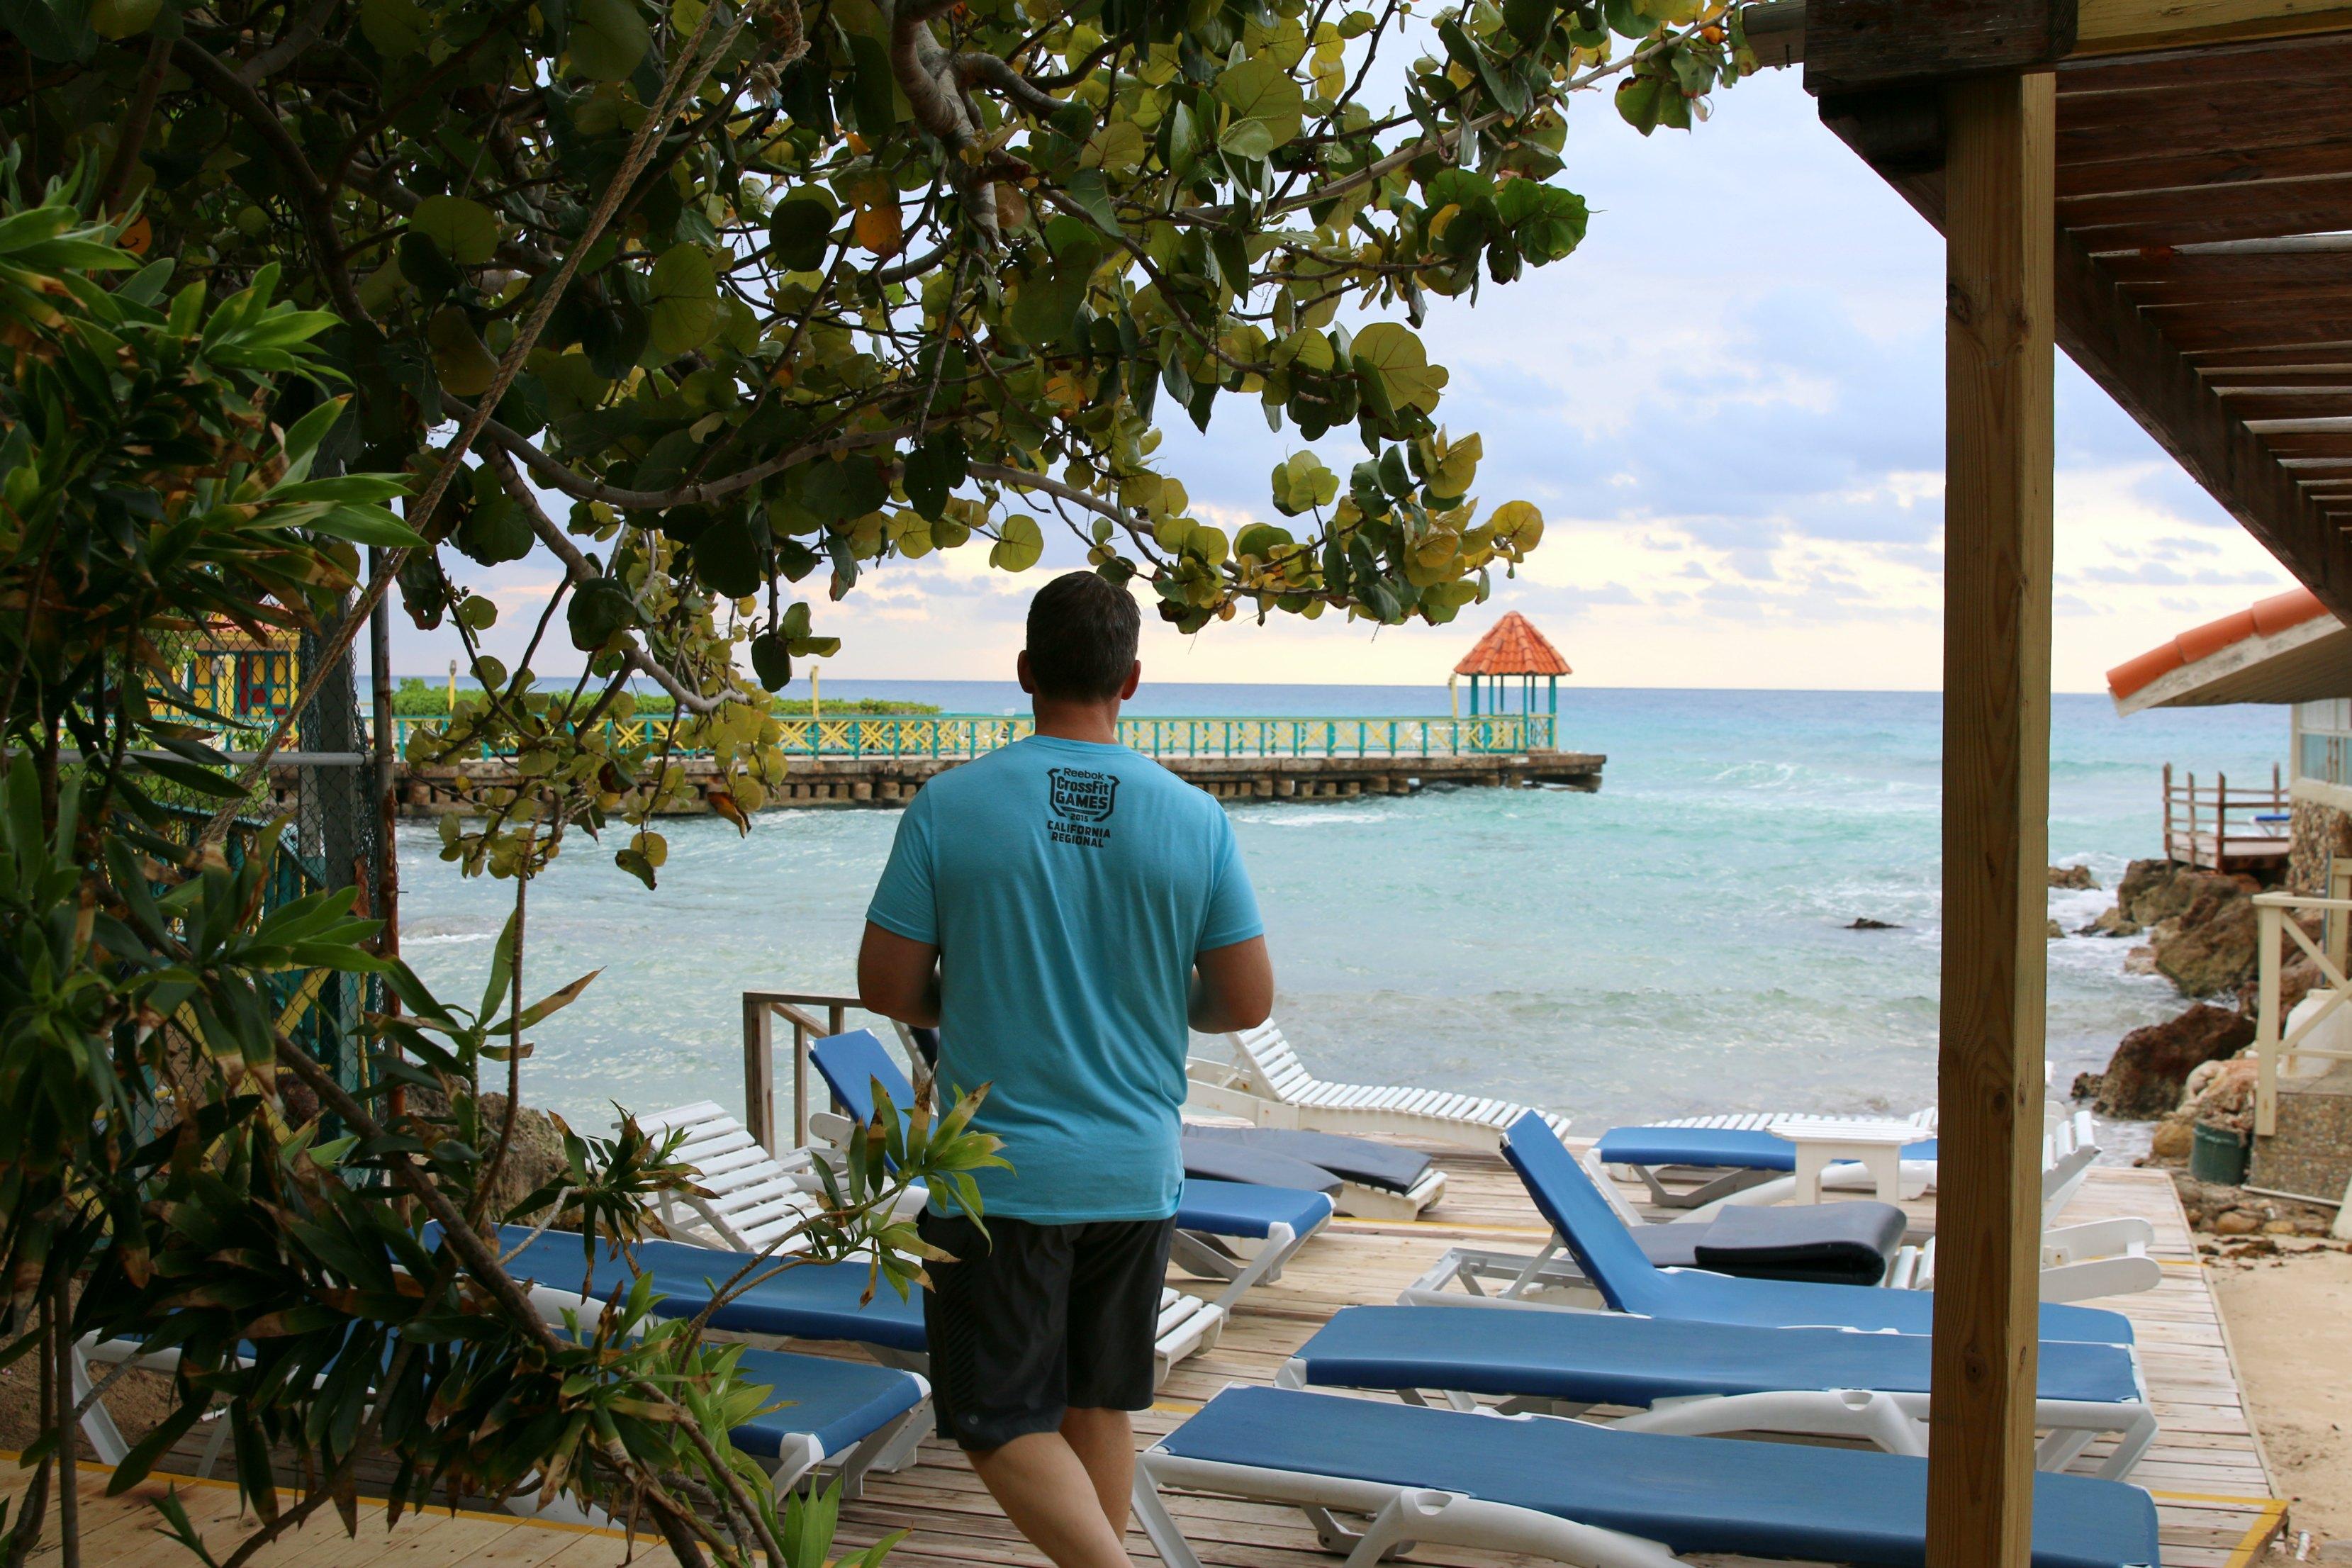 family vacation to jamaica